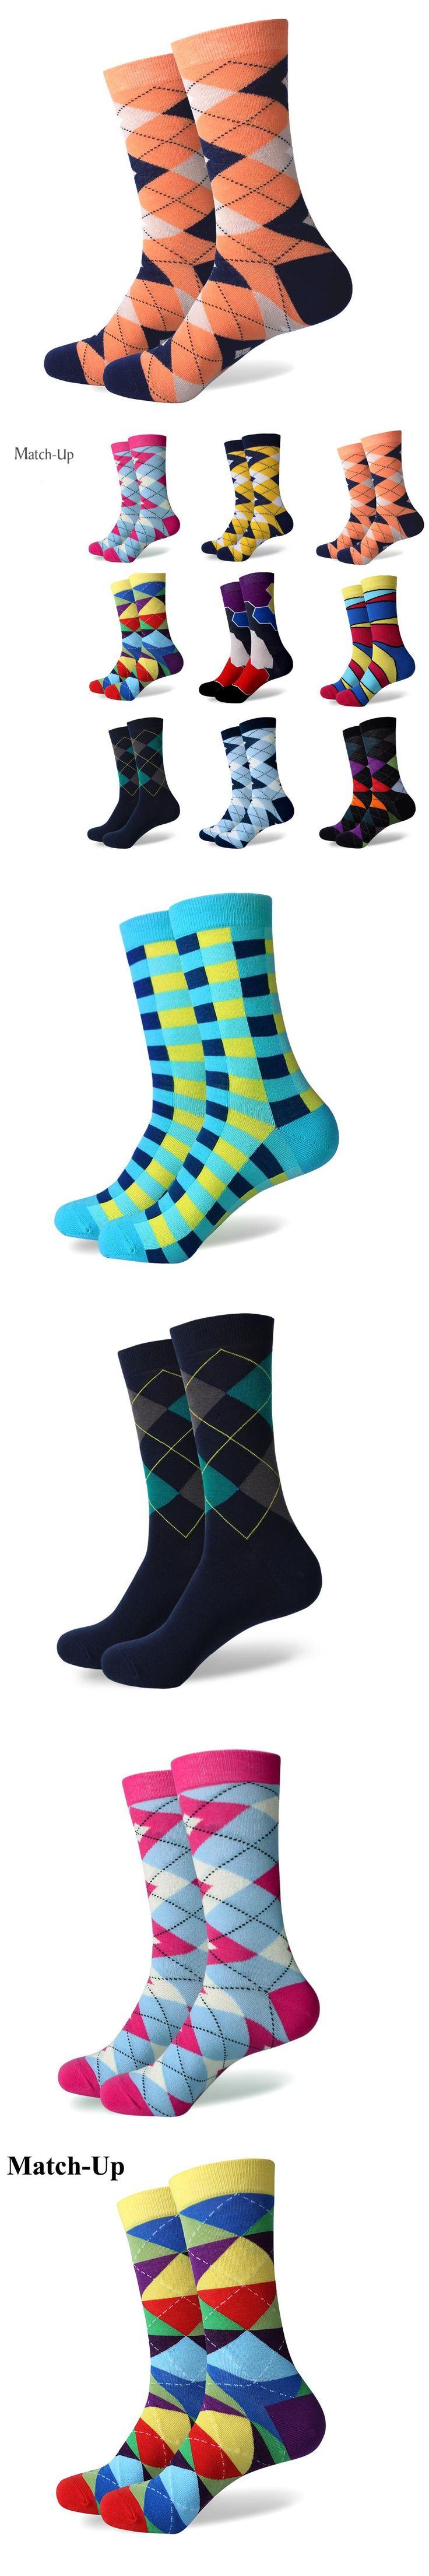 Match-Up Colorful ARGYLE SOCK fun men's Cotton Socks Wedding Gift Socks Free shipping US size(7.5-12)